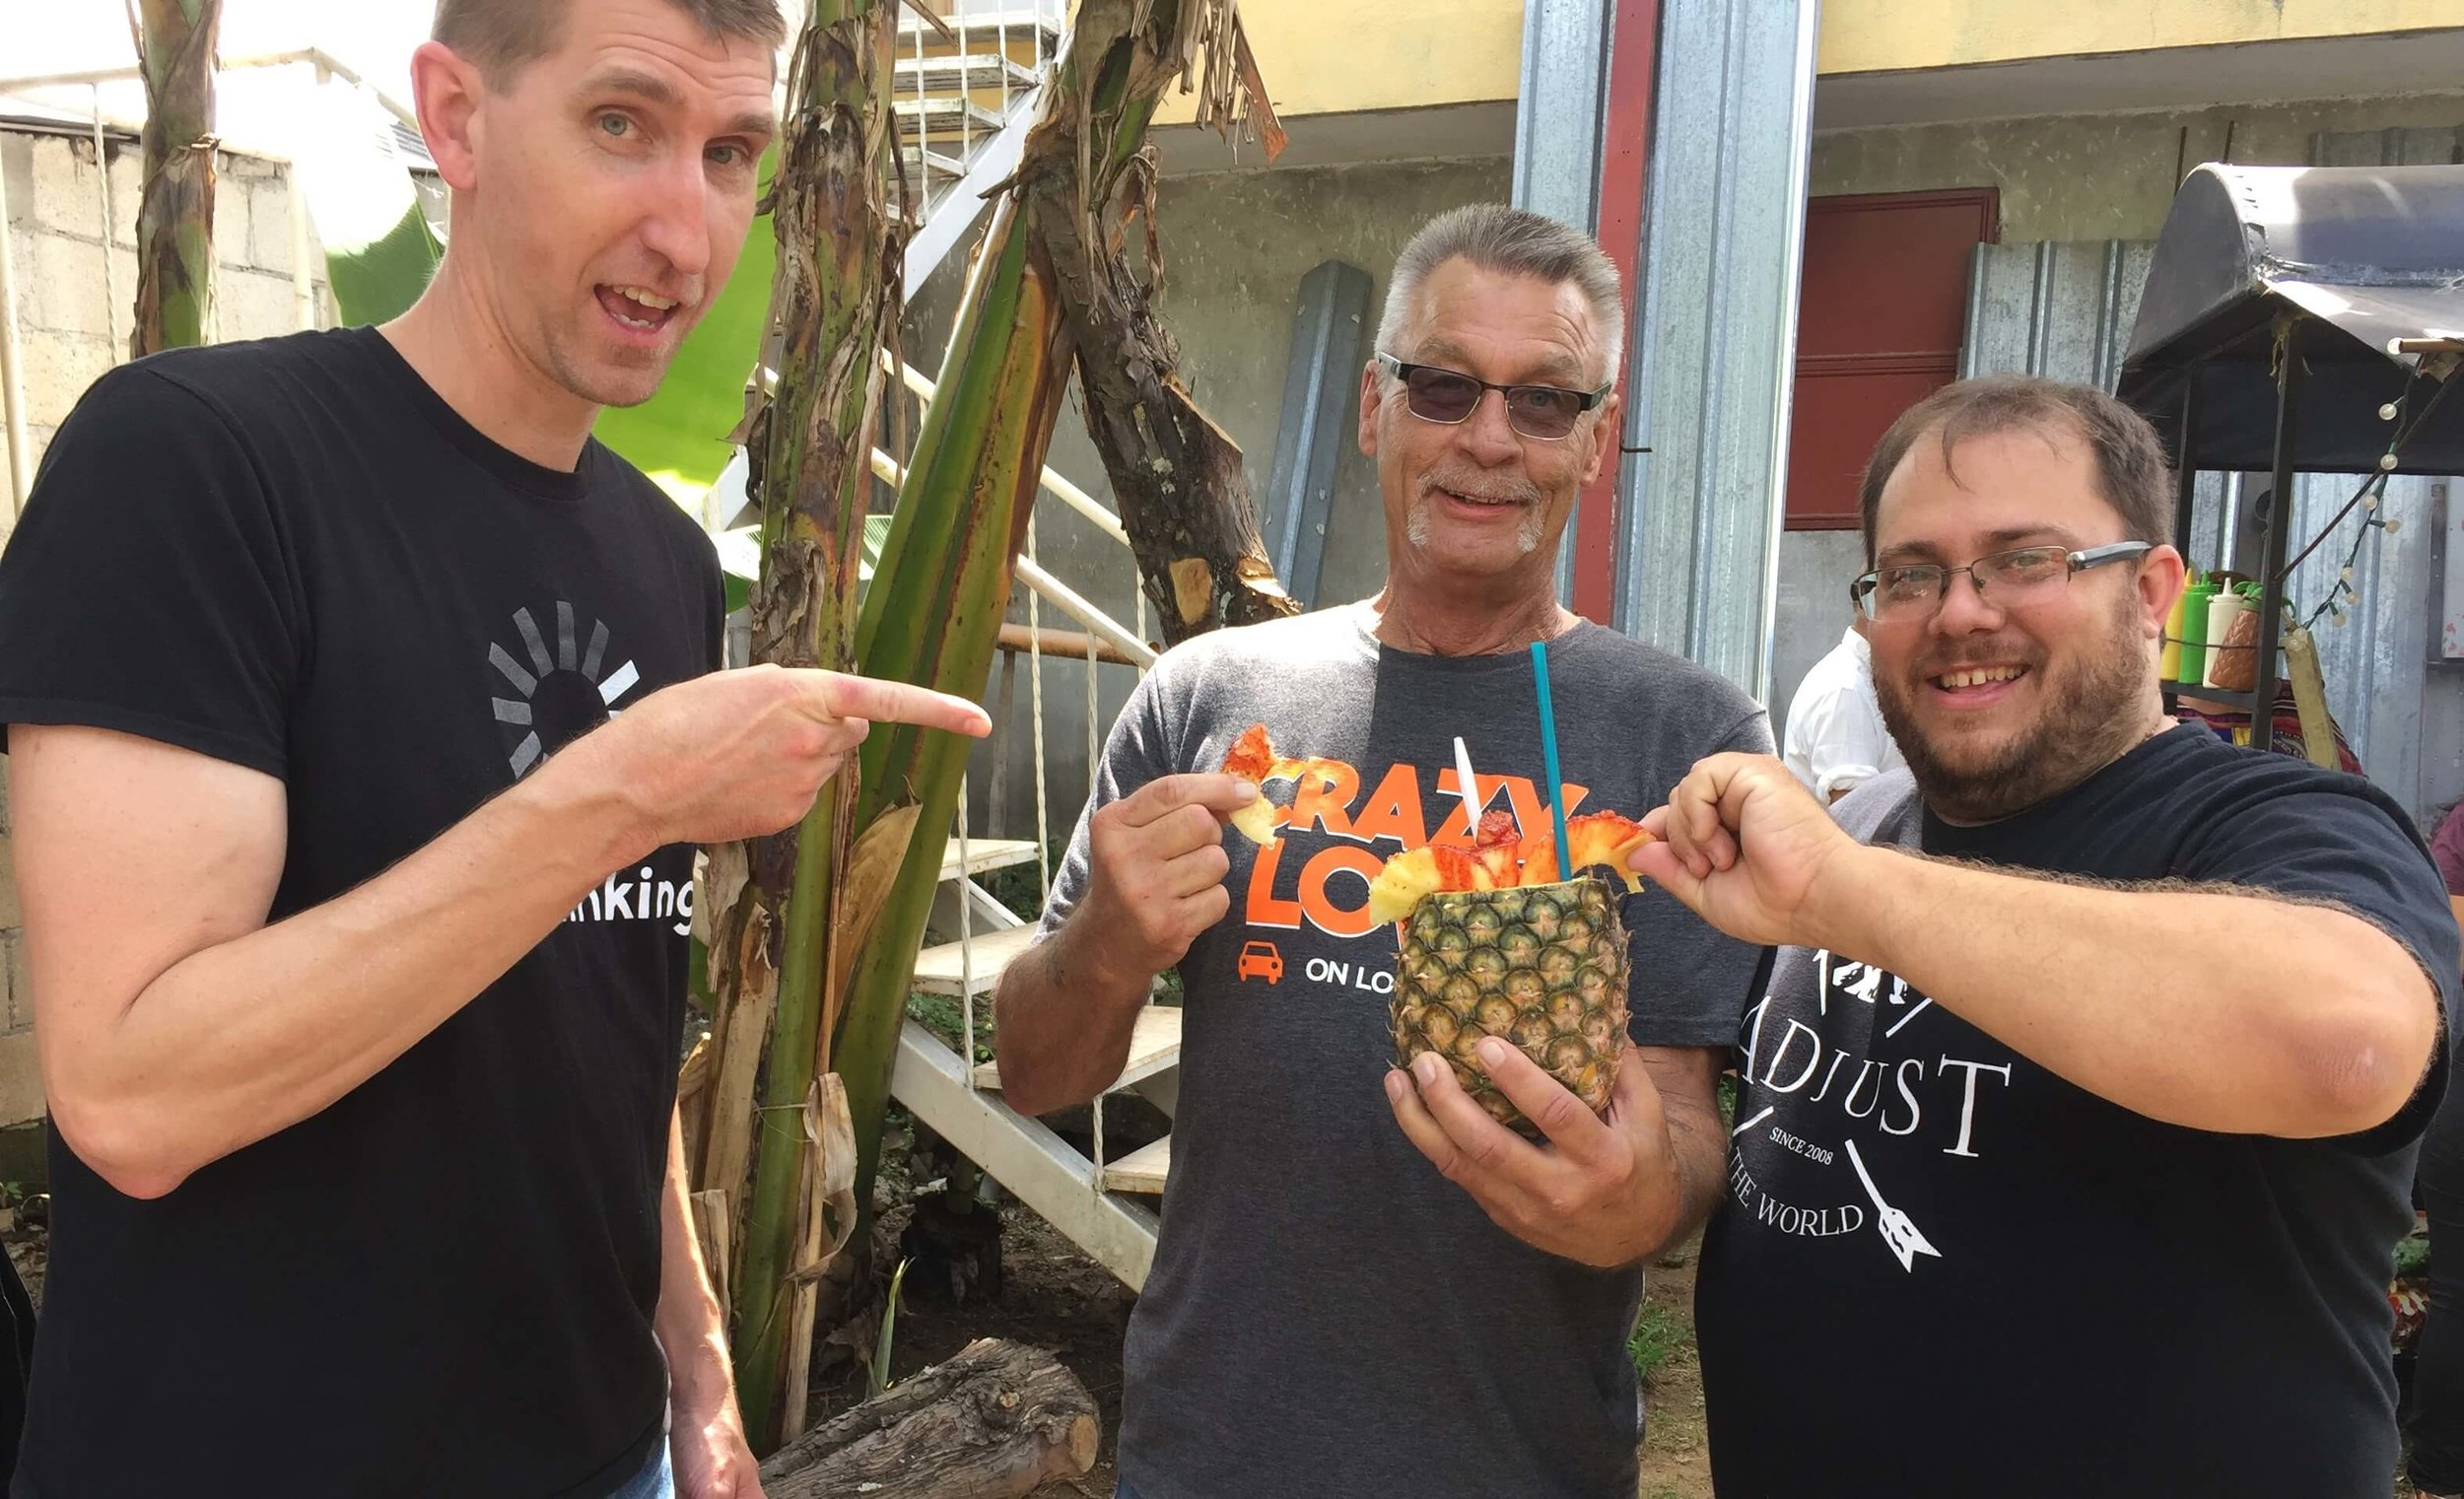 Ty, Joe, and Tim enjoyed the pineapple.